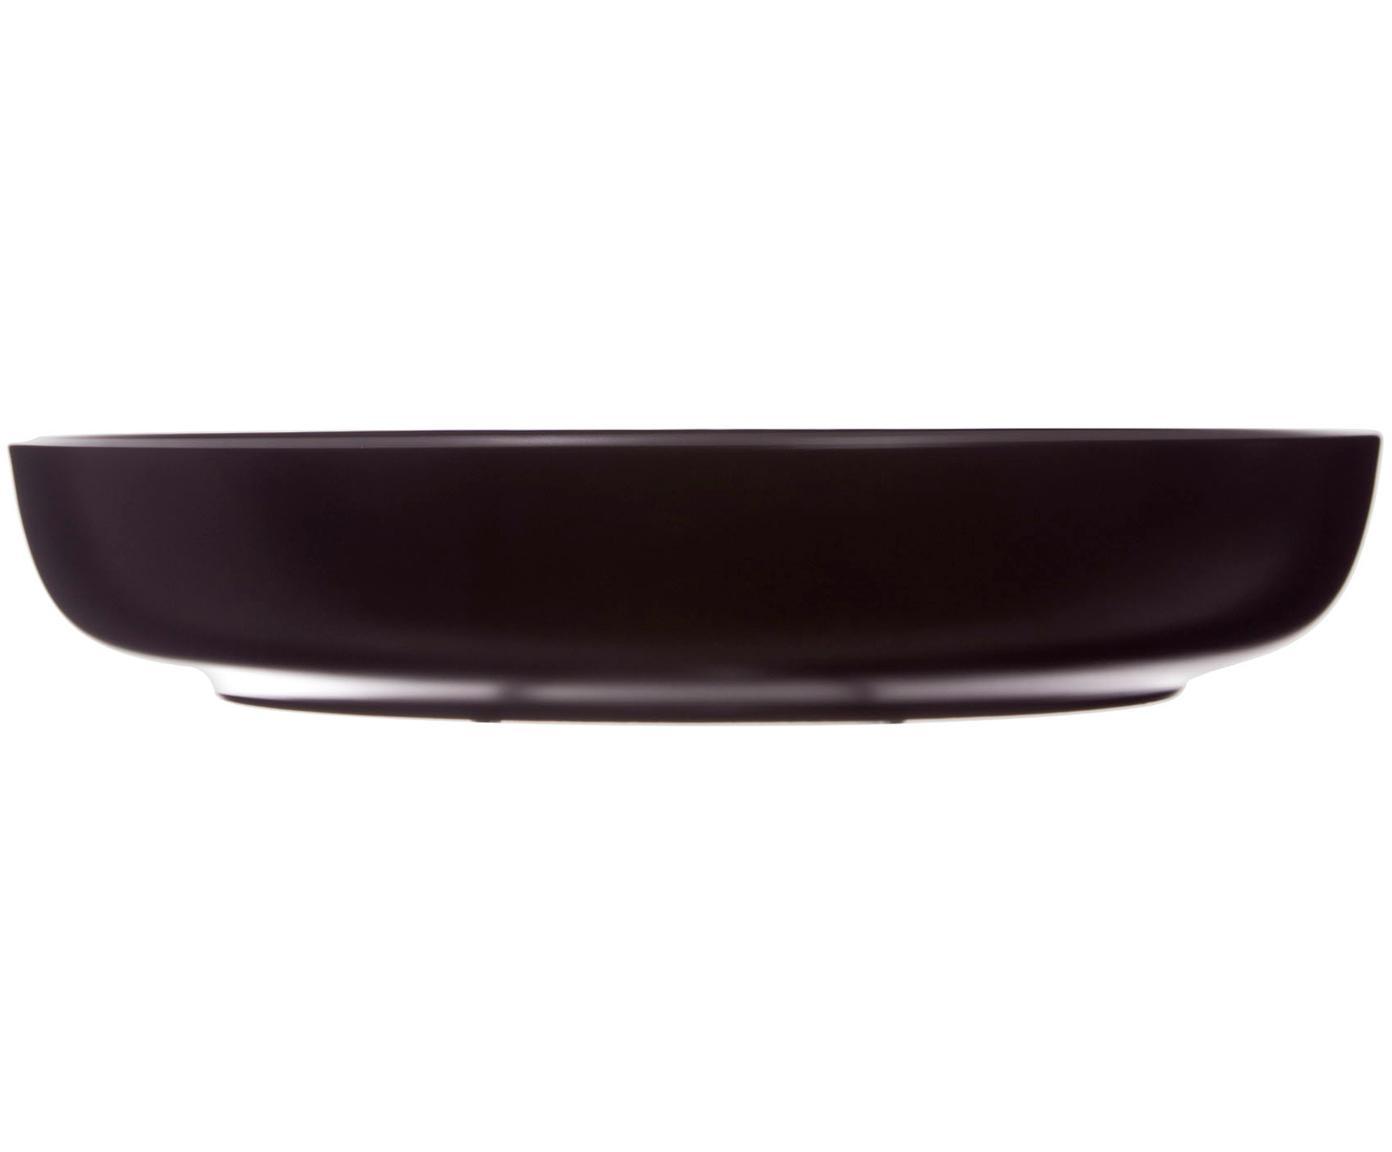 Piatto fondo Okinawa 6 pz, Ceramica, Nero opaco, Ø 22 x Alt. 4 cm